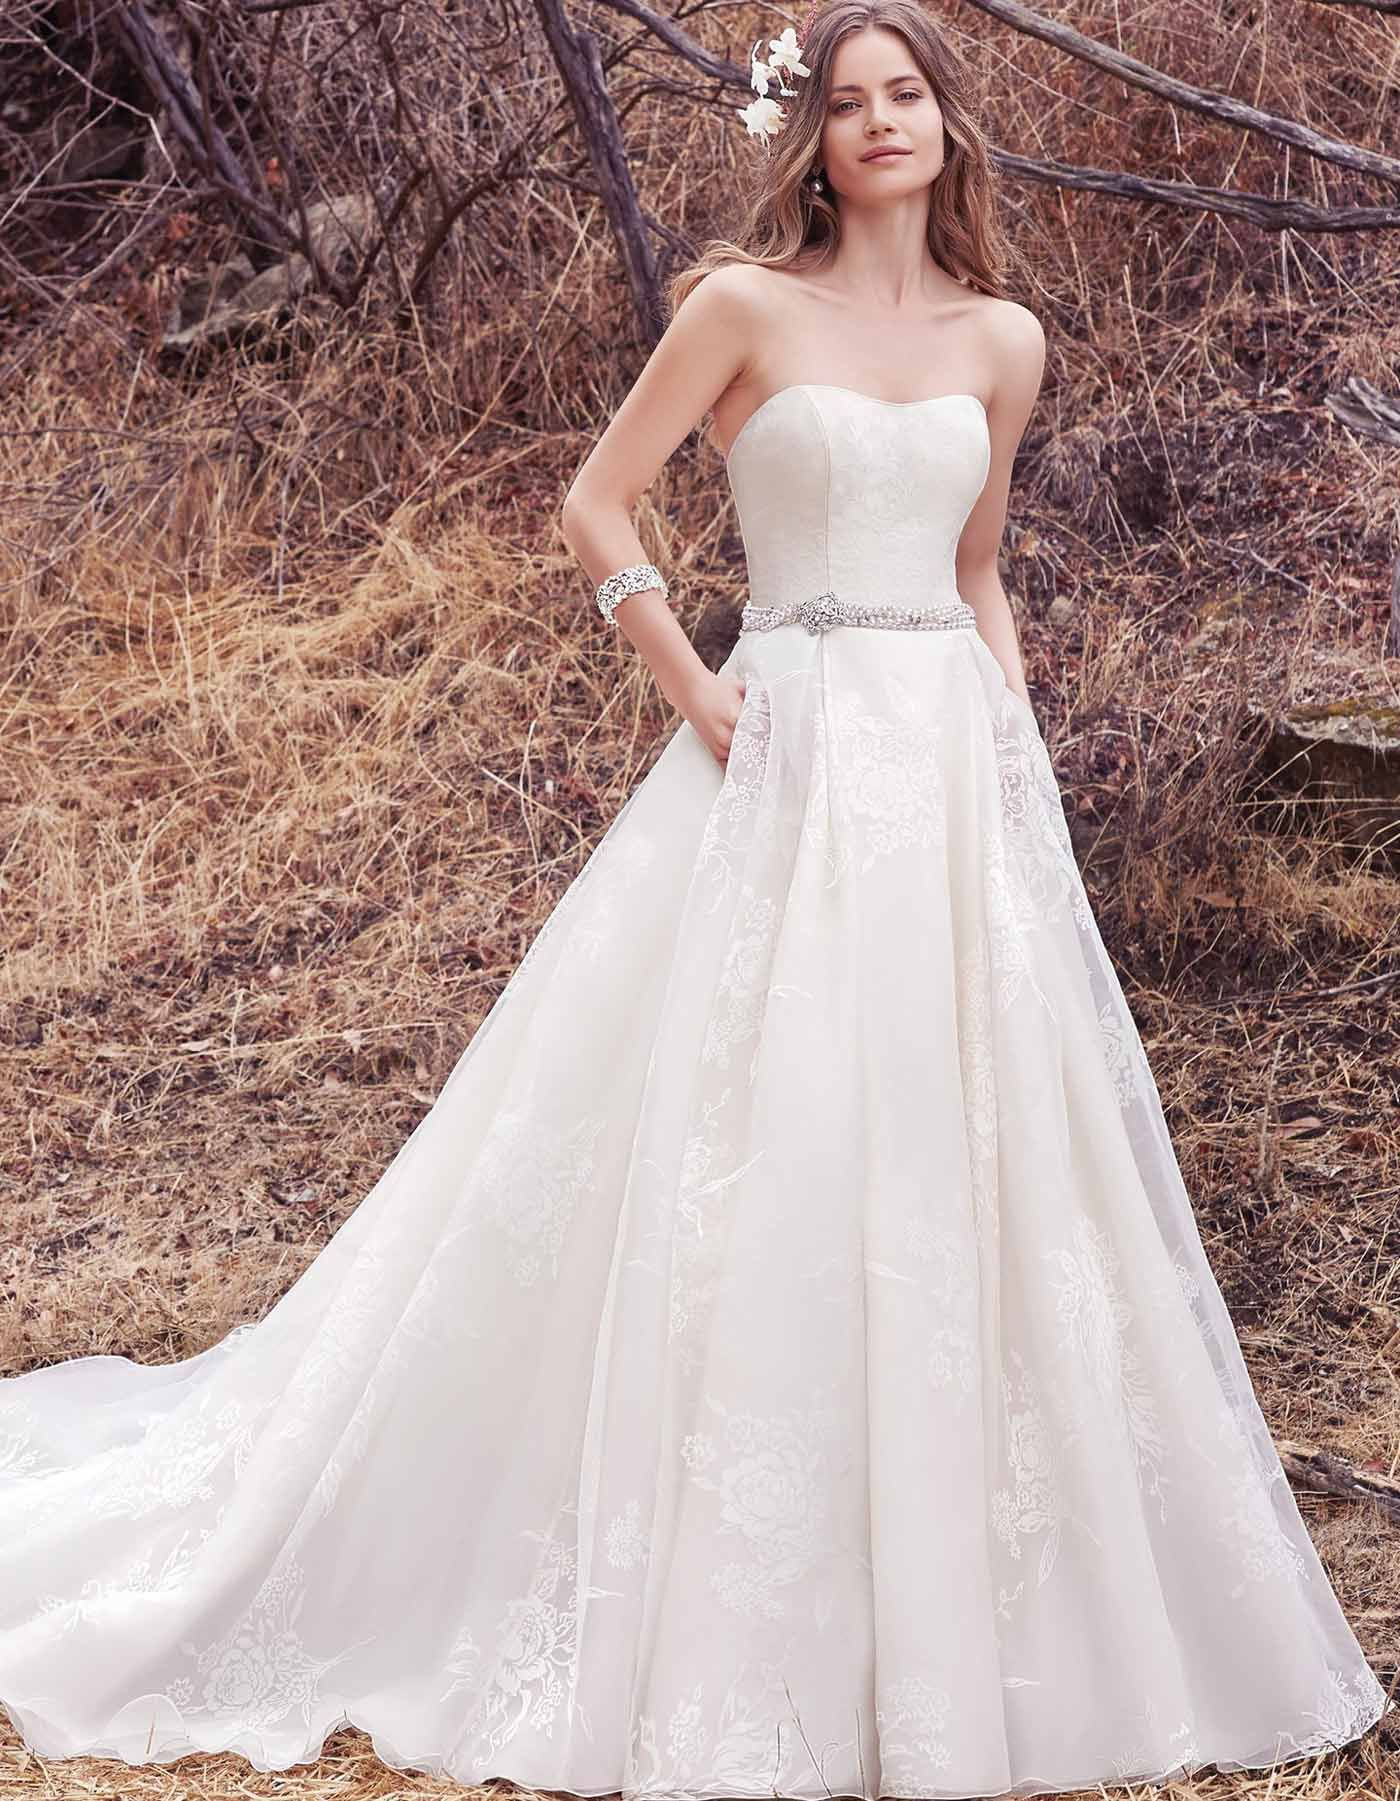 Floral Organza Ballgown Wedding Dress